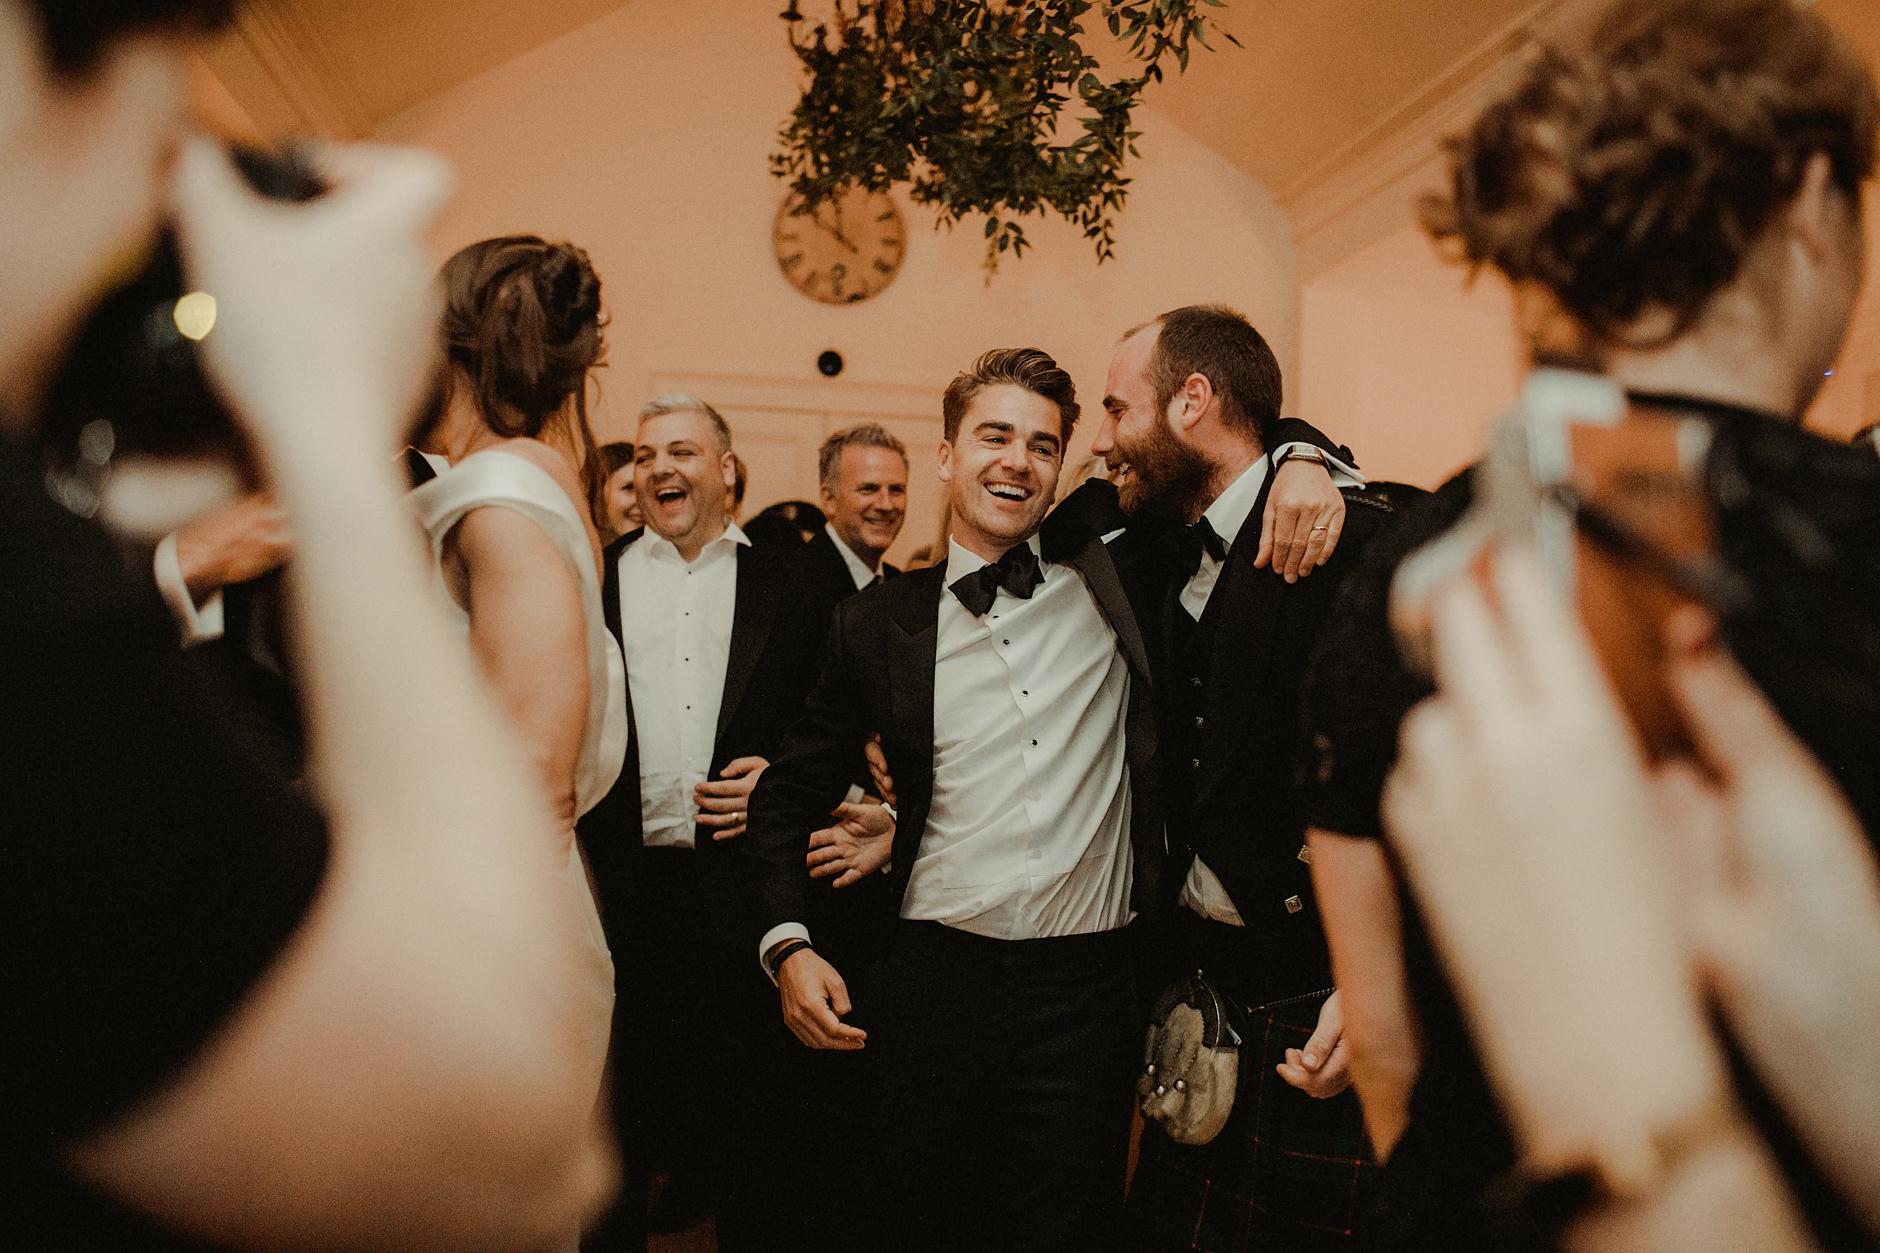 Glentruim-Wedding-Nikki-Leadbetter-Photography-389.jpg